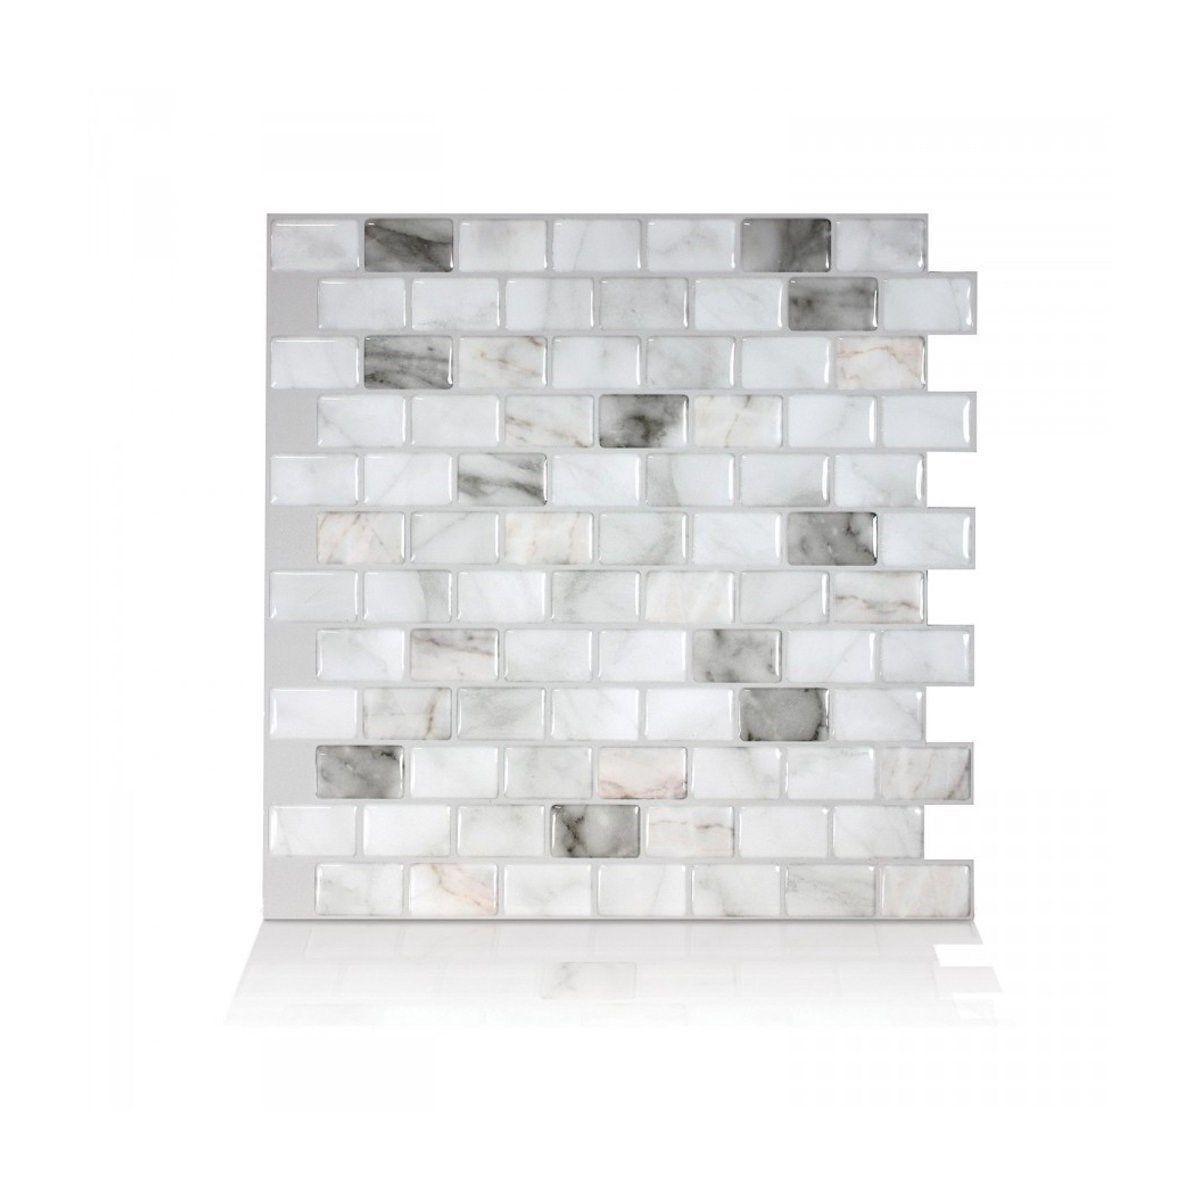 Carrelage Mural Adhesif 3d Smart Tiles Ravenna Blanc X6 Taille